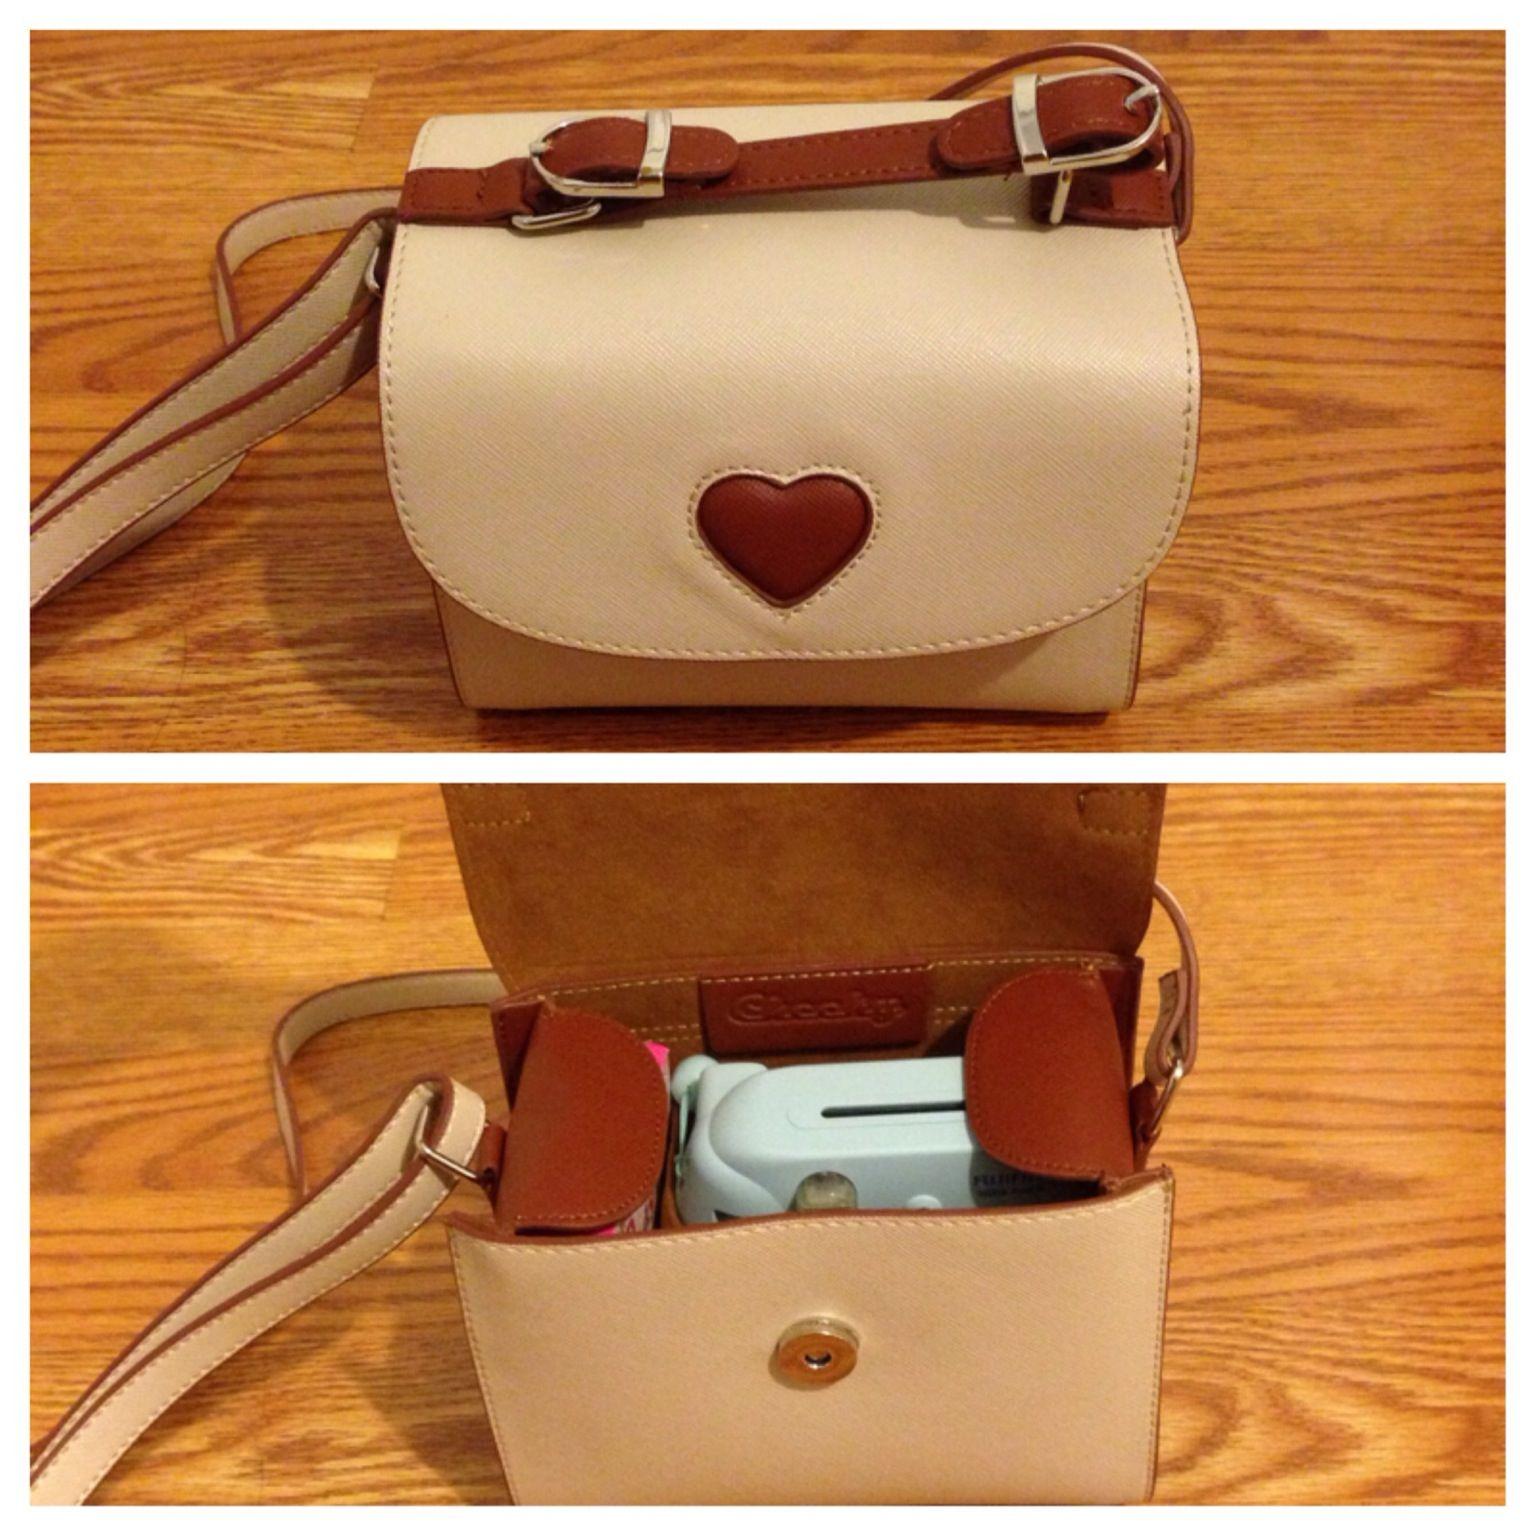 Loving my new camera case...i.e. my new purse. Made to fit the Fujifilm instax mini 8